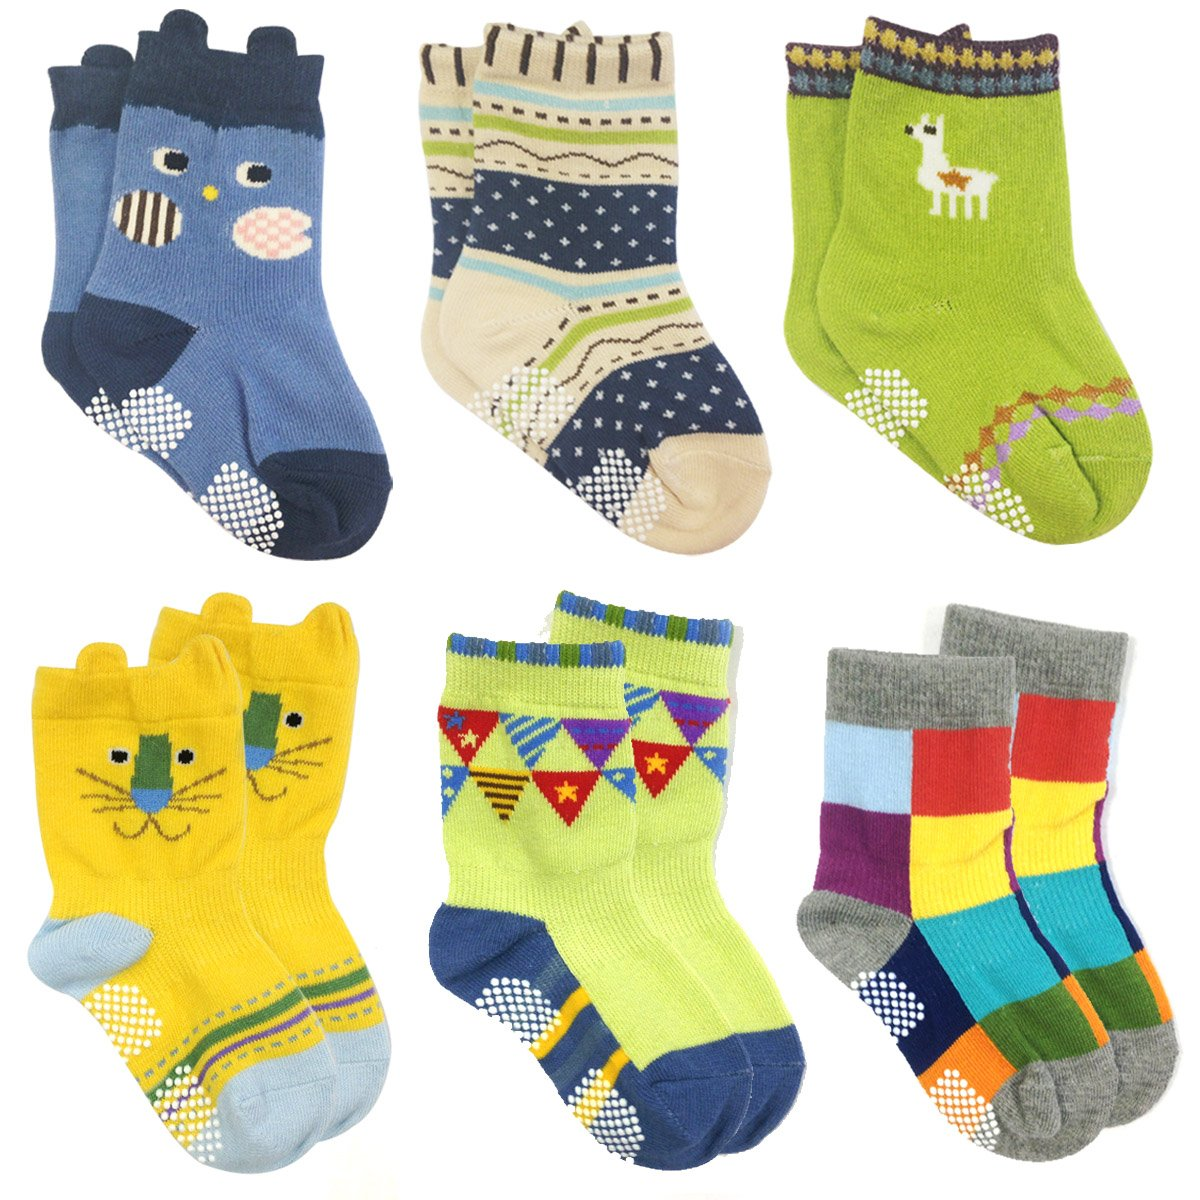 Set of 6 Small ALLYDREW Peek A Boo Animal Non-Skid Boys Toddler Socks